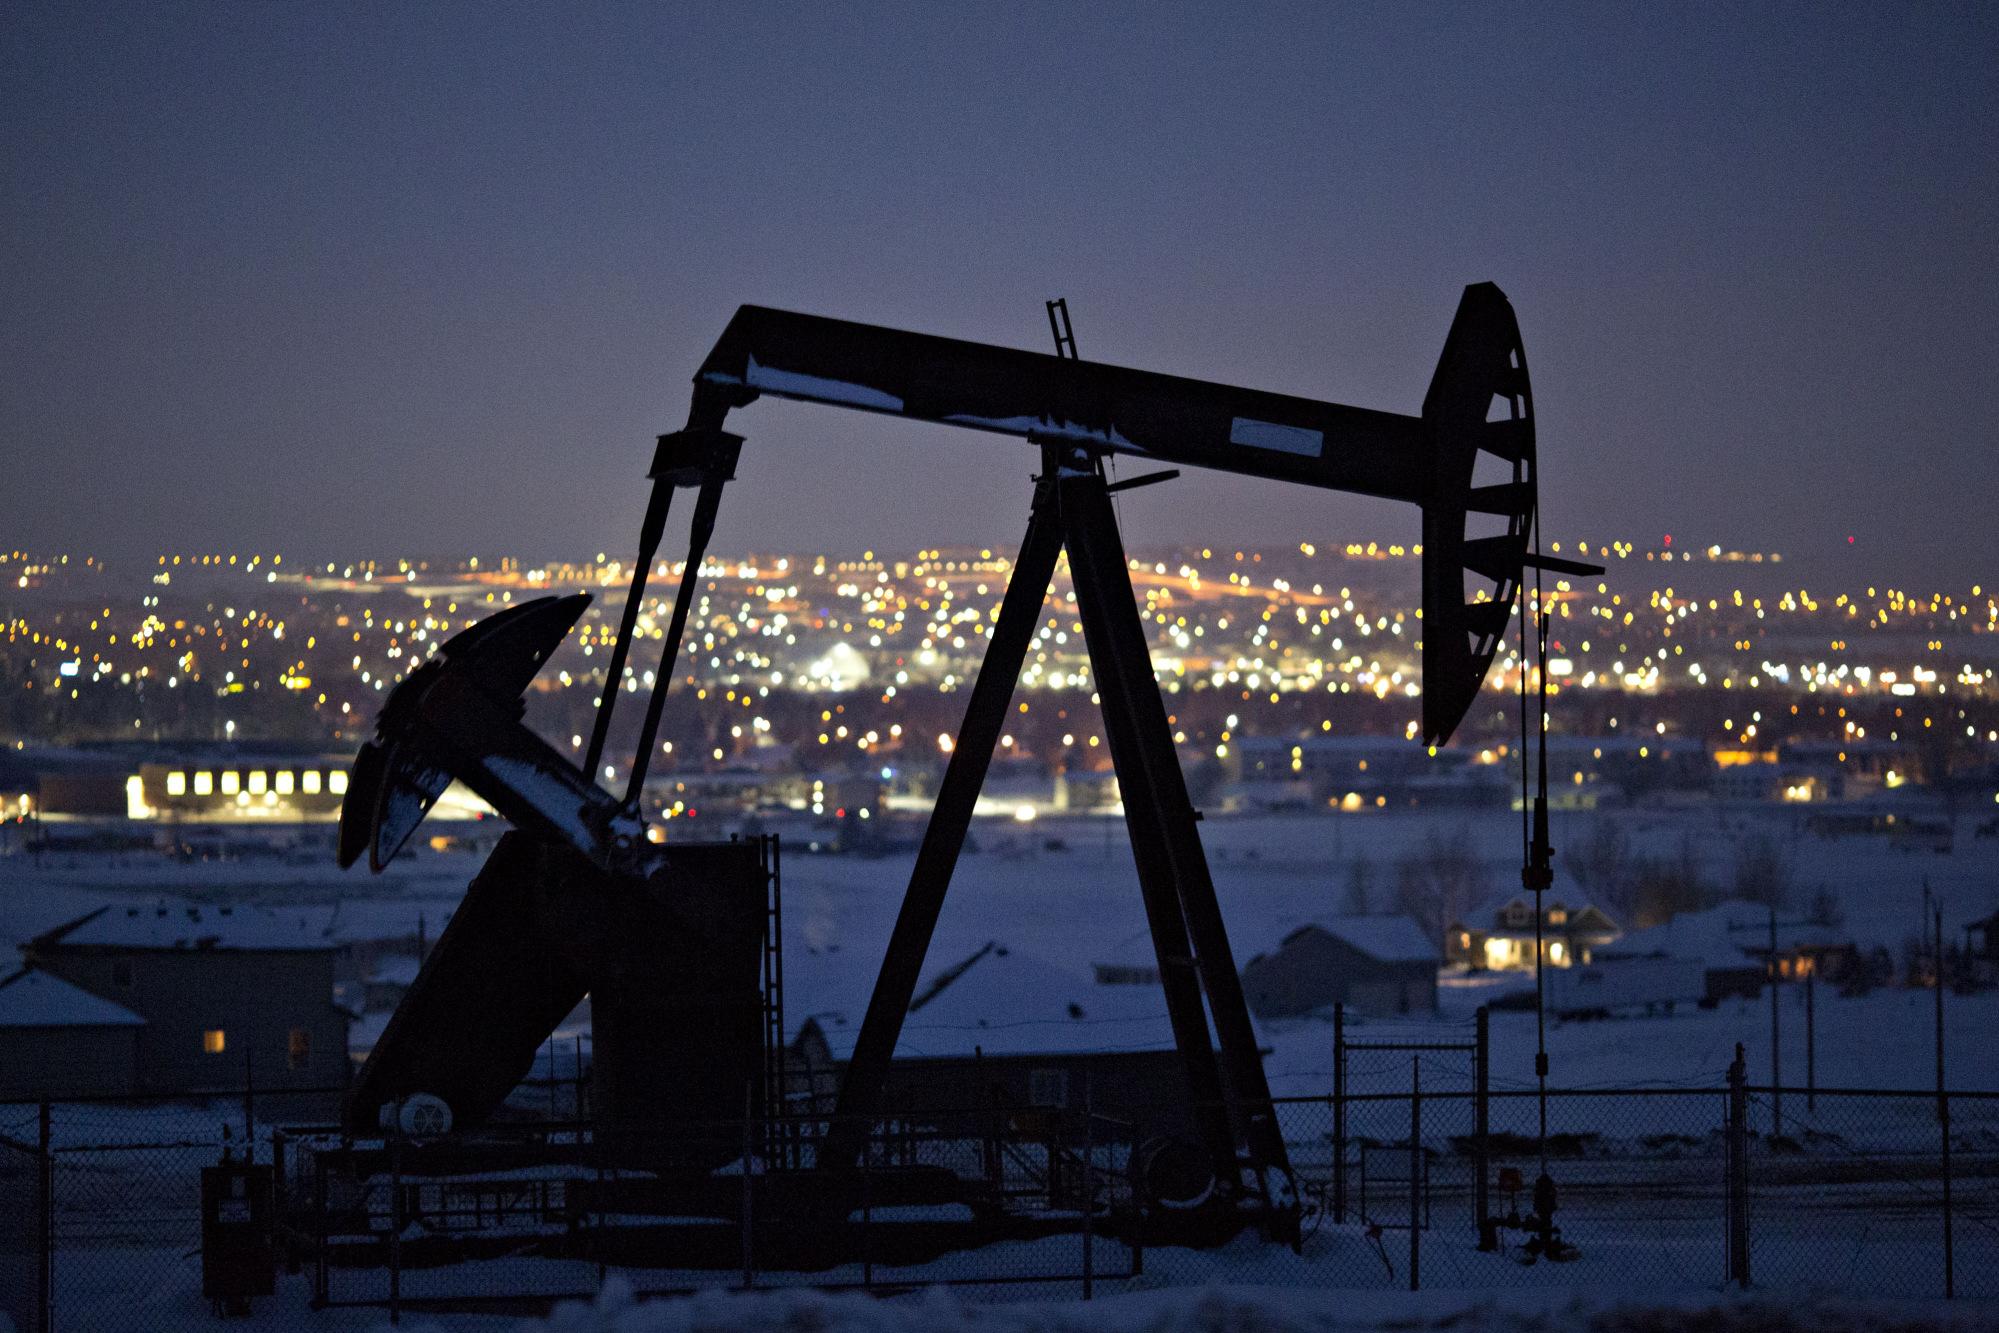 A pumpjack at an oil well in North Dakota, U.S.